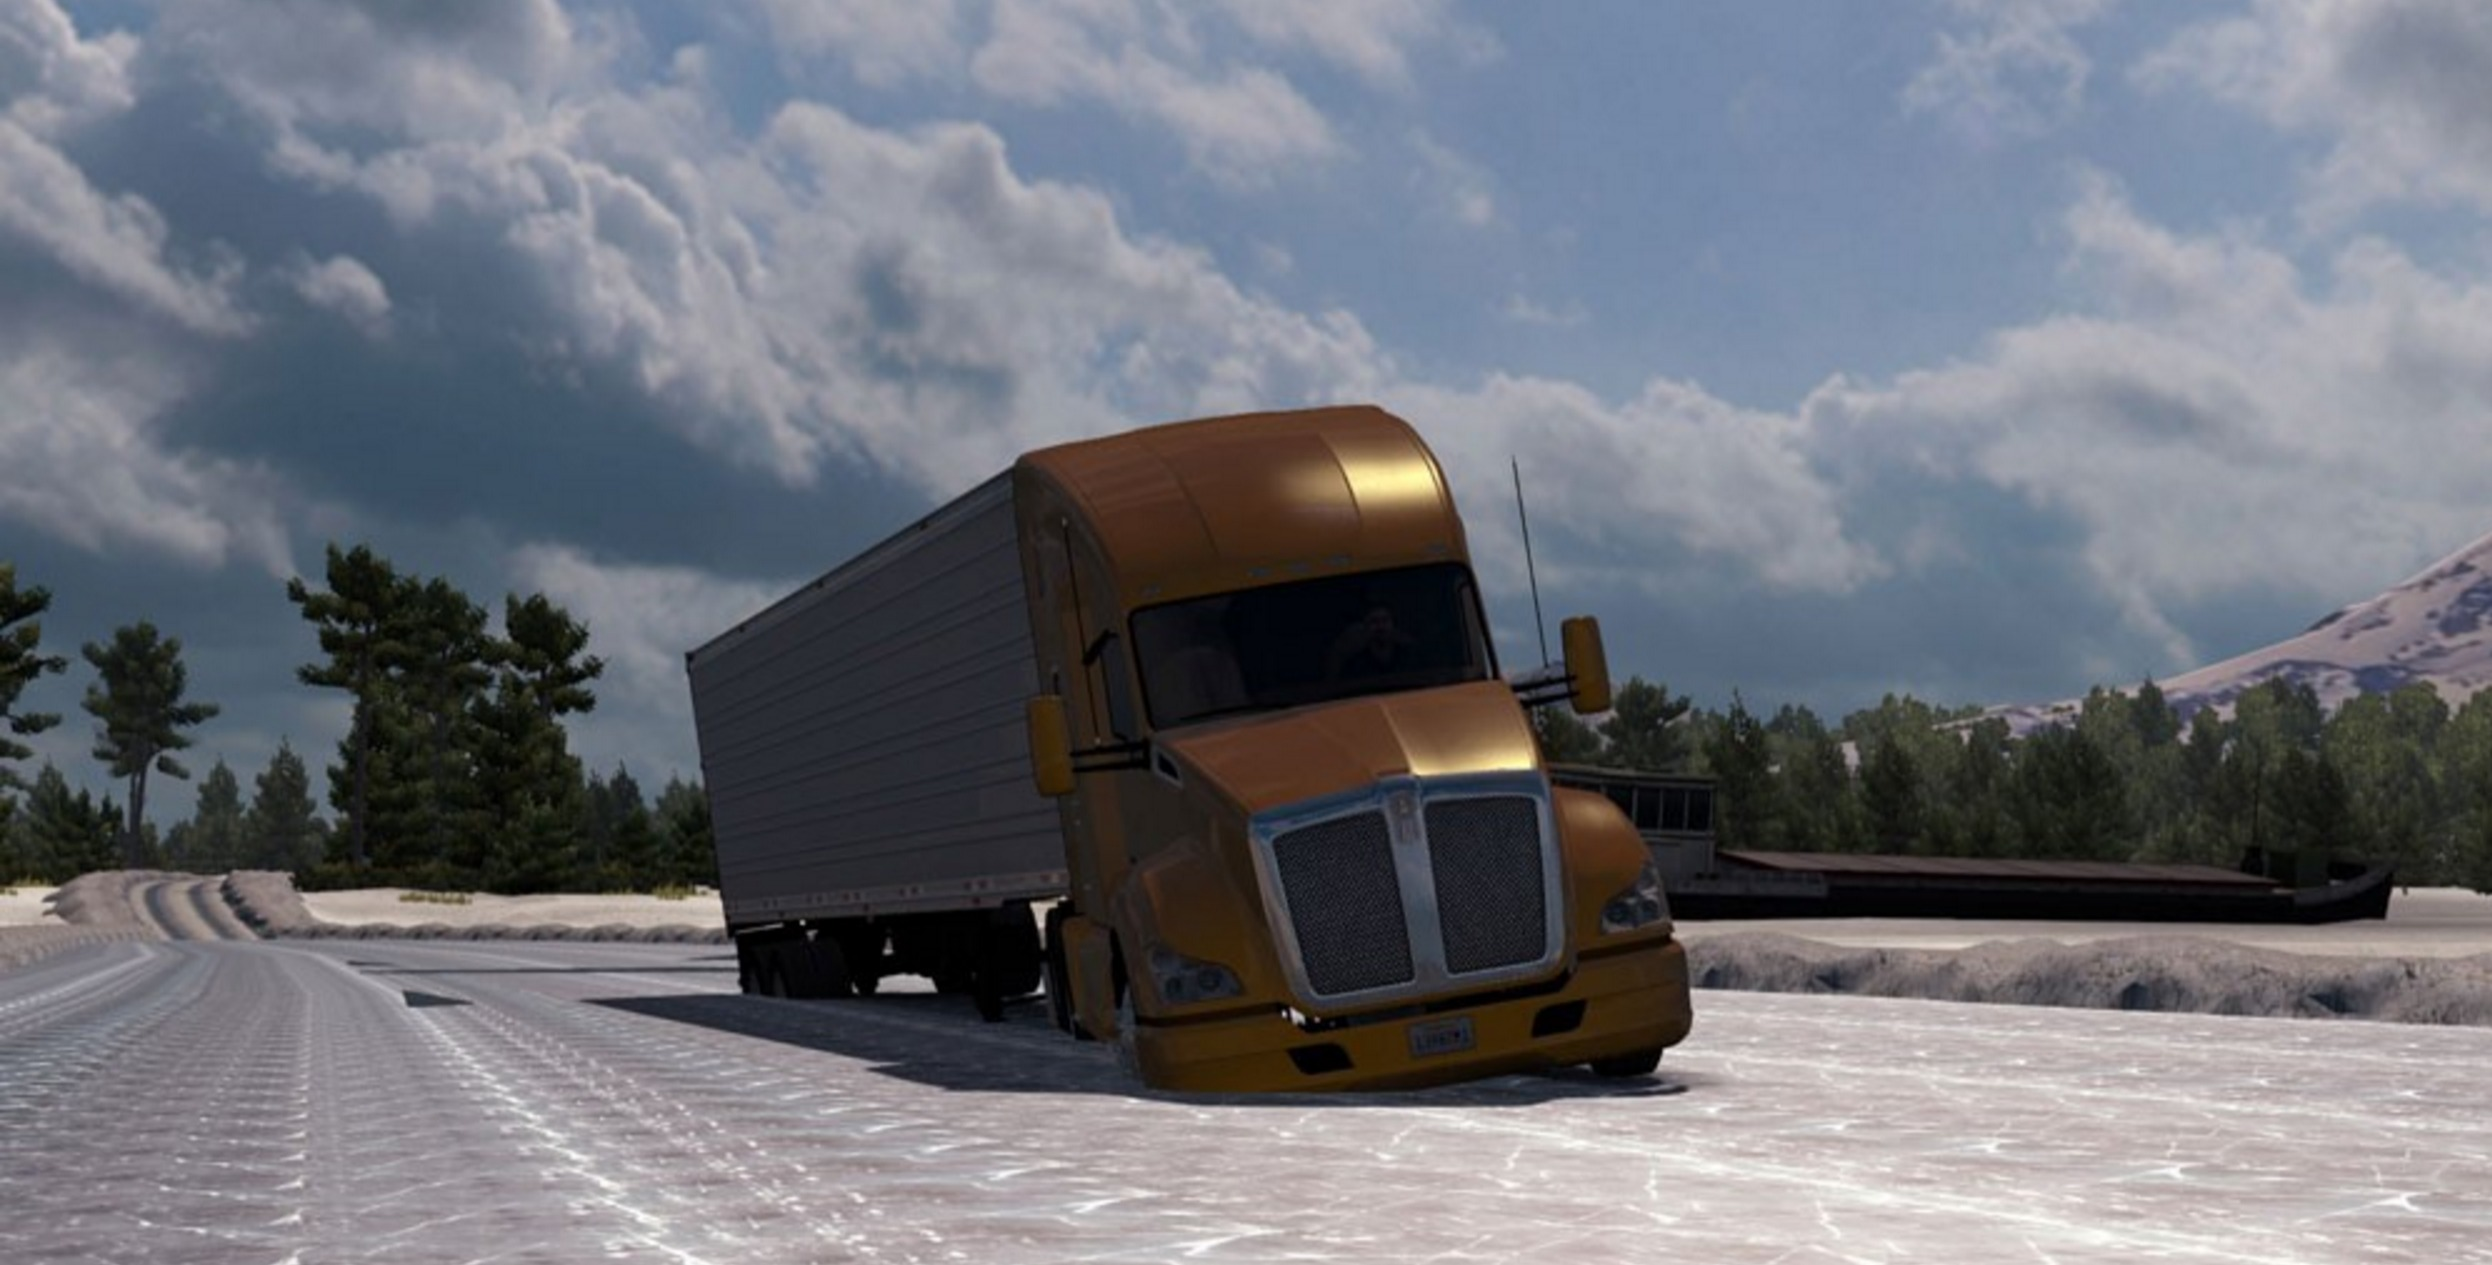 USA Offroad Alaska Map v 13 American Truck Simulator mod ATS mod